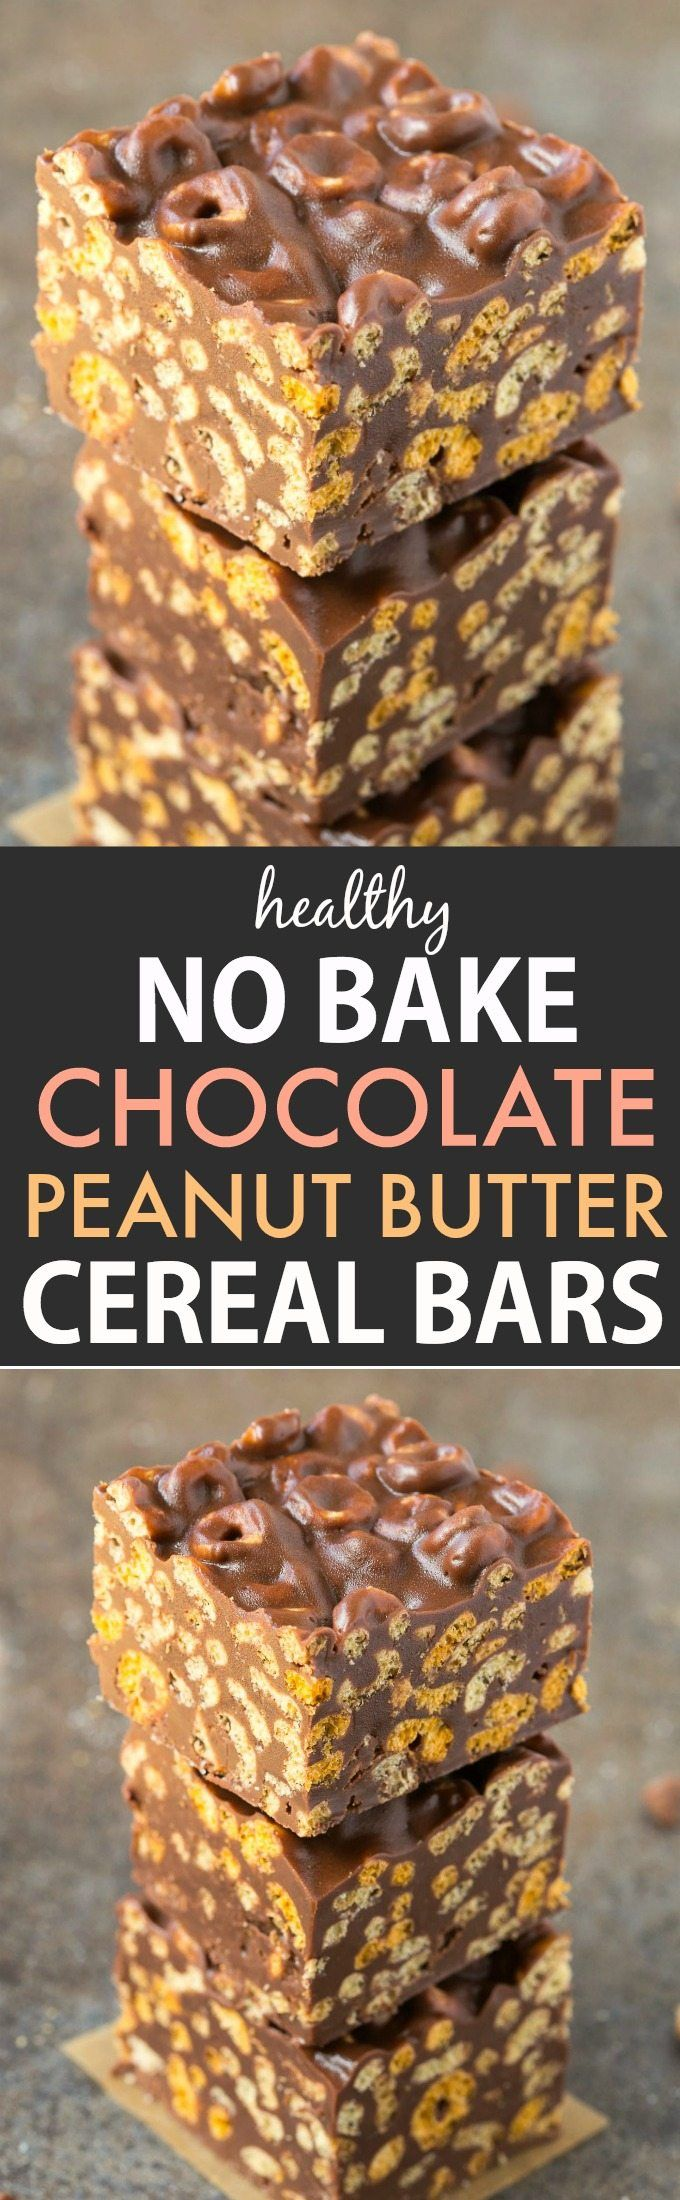 Healthy Recipes : Healthy No Bake Chocolate Peanut Butter